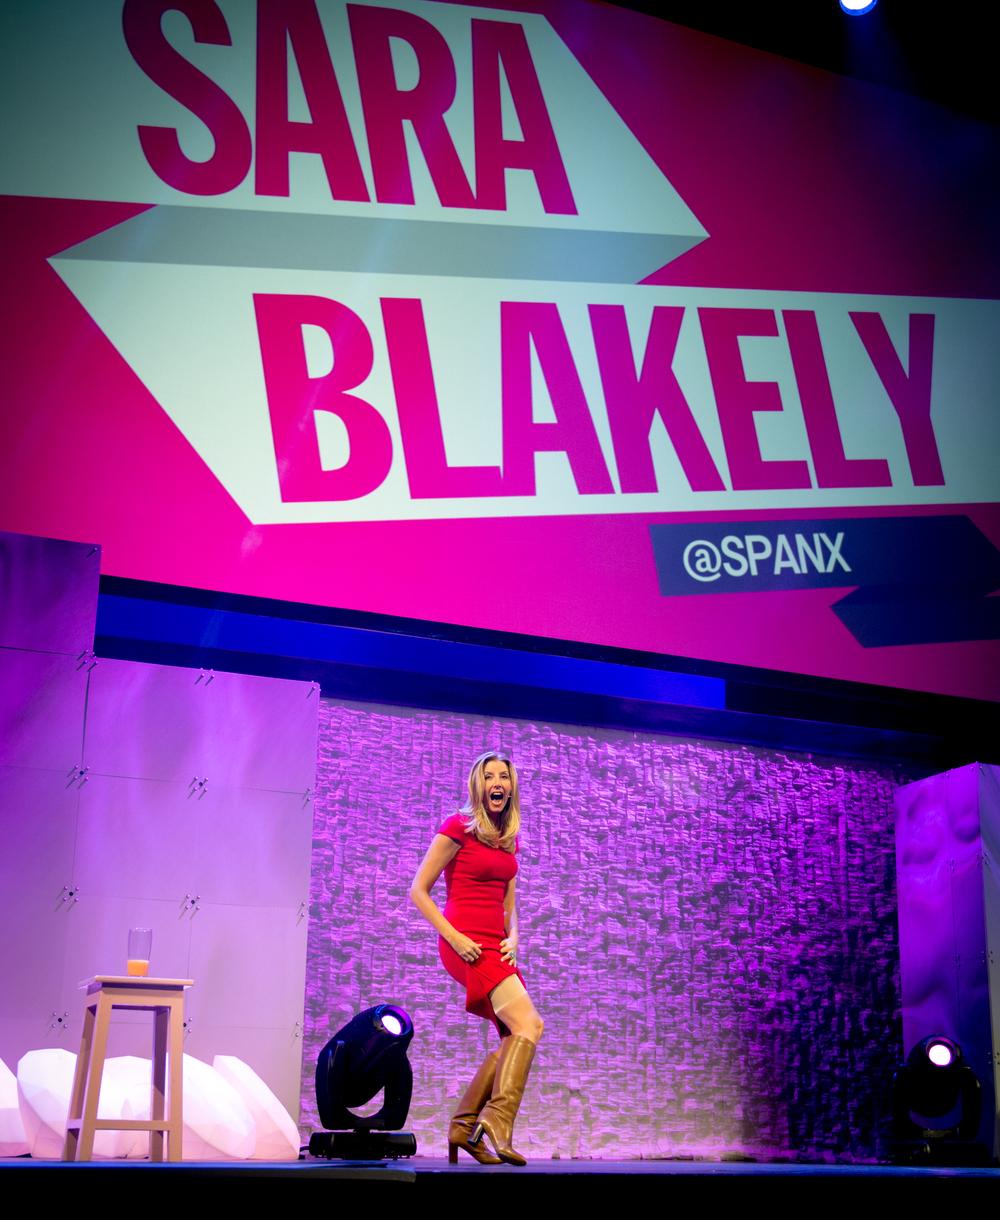 Sara Blakely of Spanx